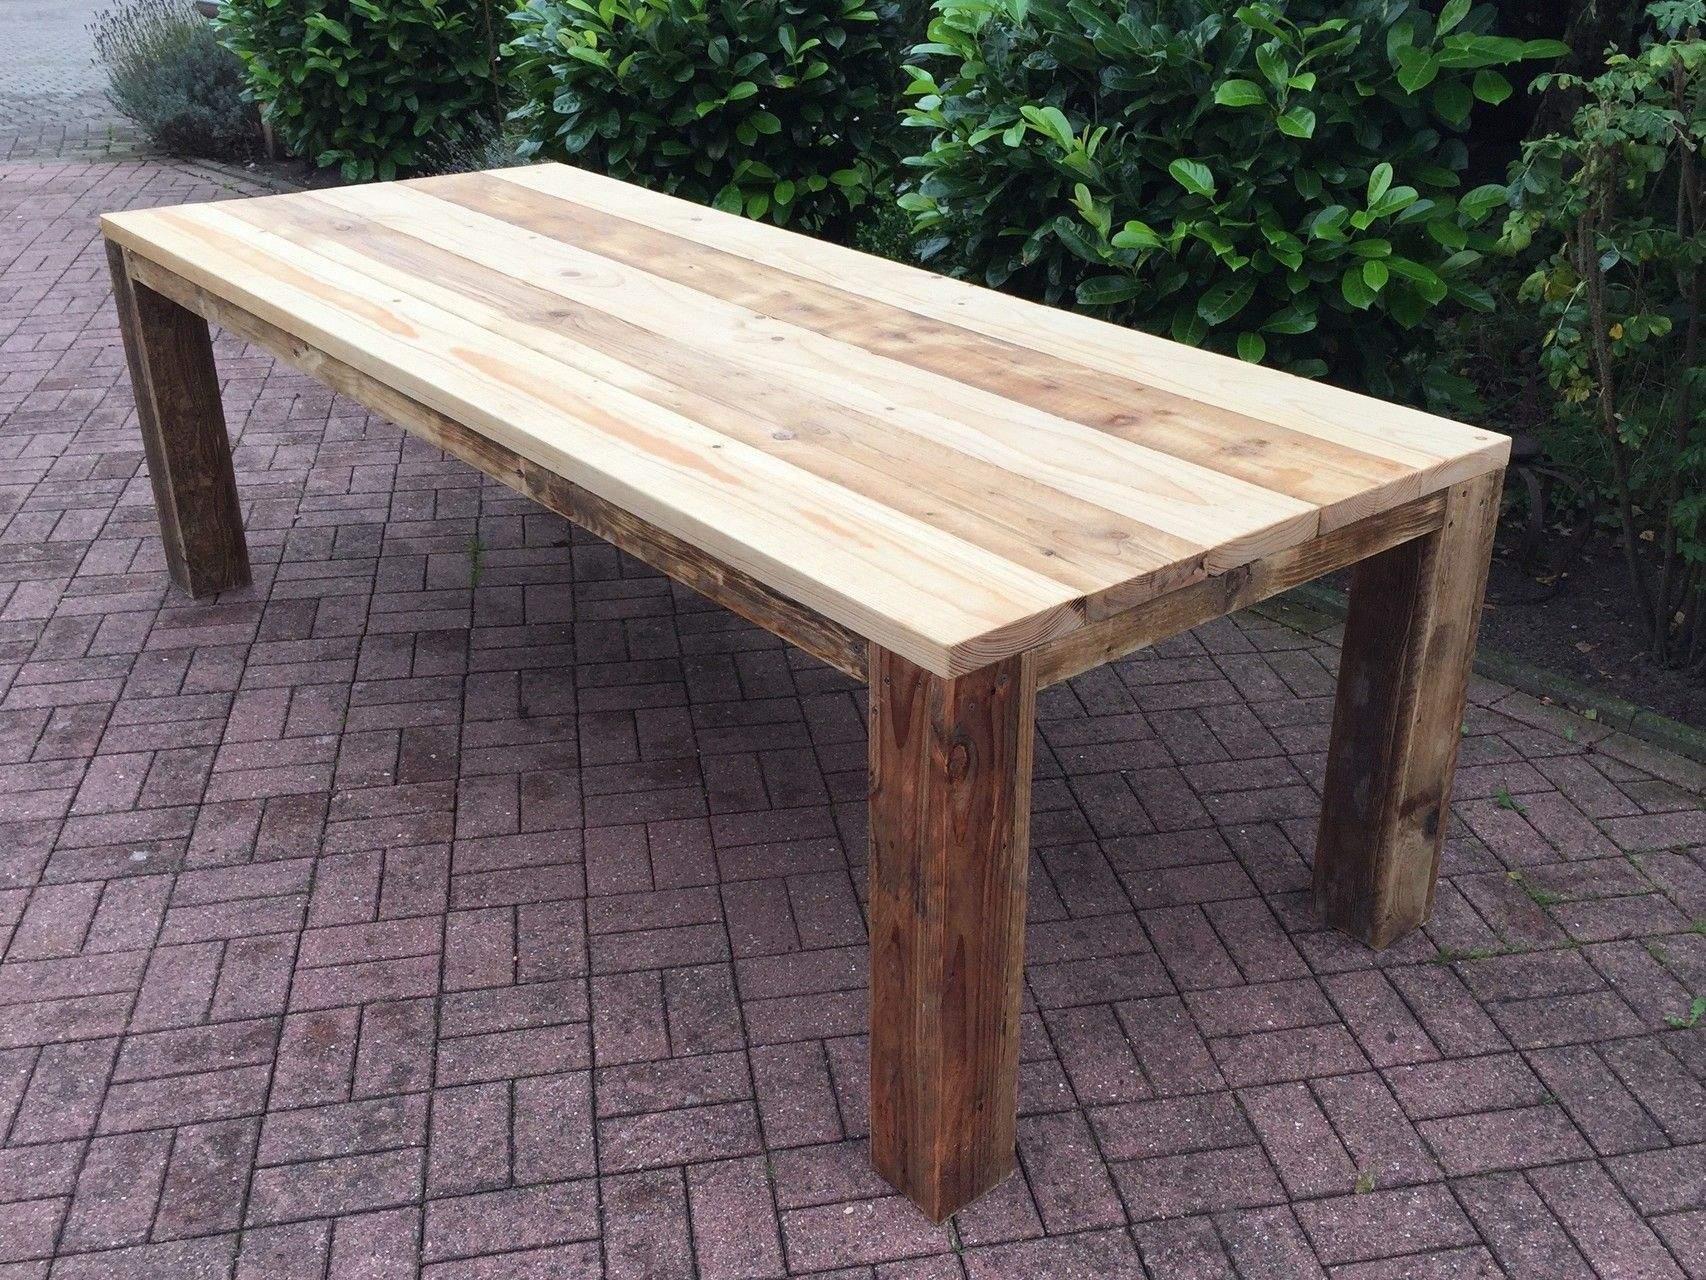 Holztisch Garten Massiv Schön Gartentisch Aus Gebrauchtem Bauholz Geölt